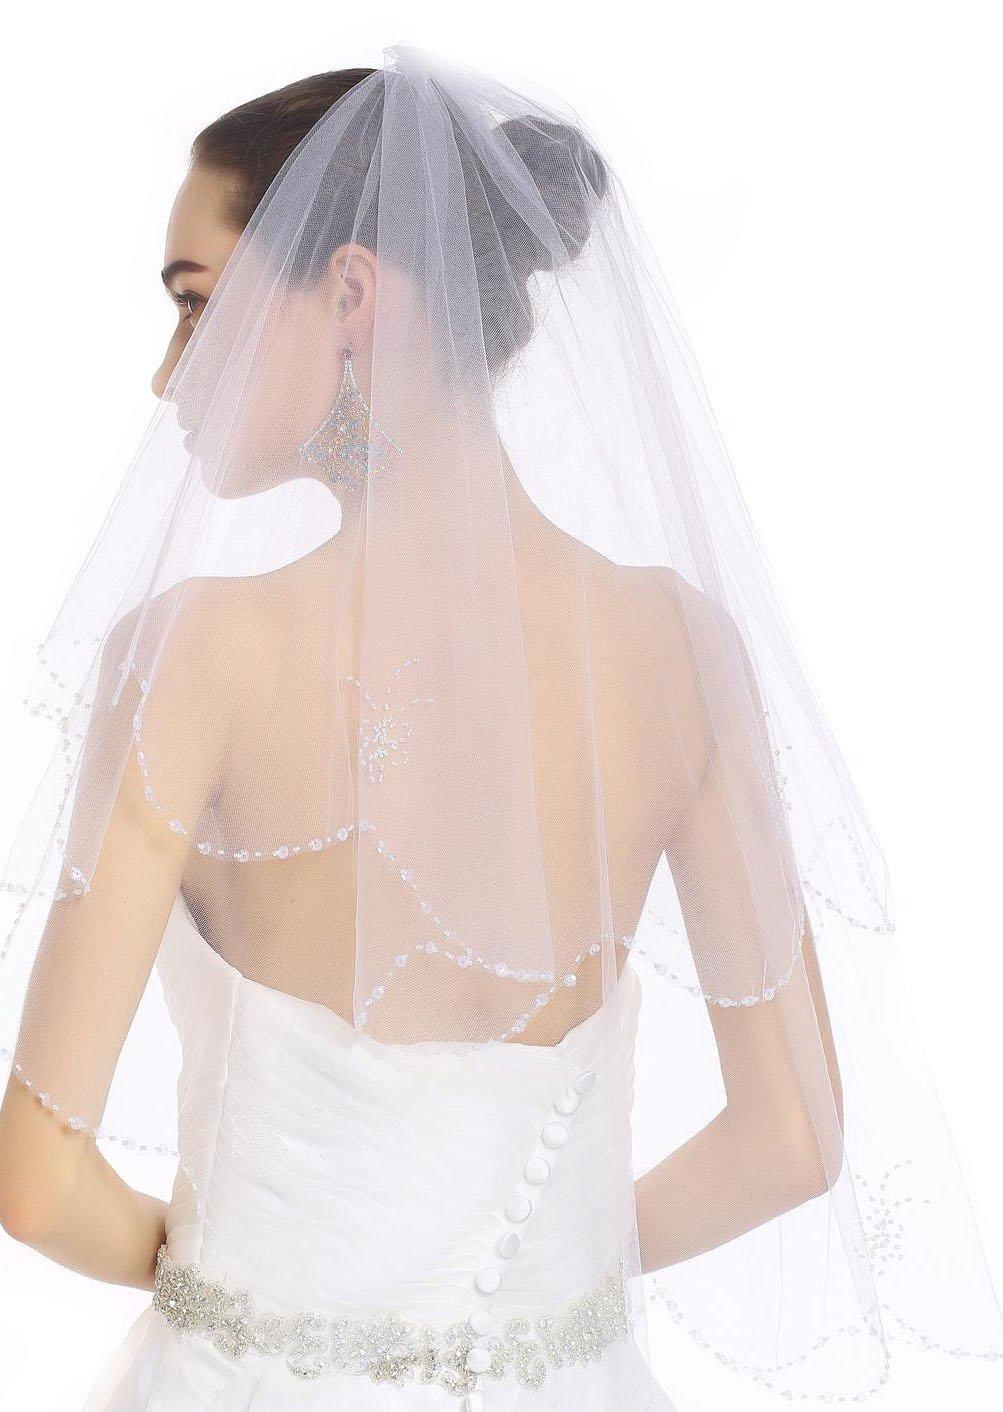 Passat White Two Tier NEW! Rhinestone Scrolled Scallop-Edge Fingertip Cheap Bridal Veil 257